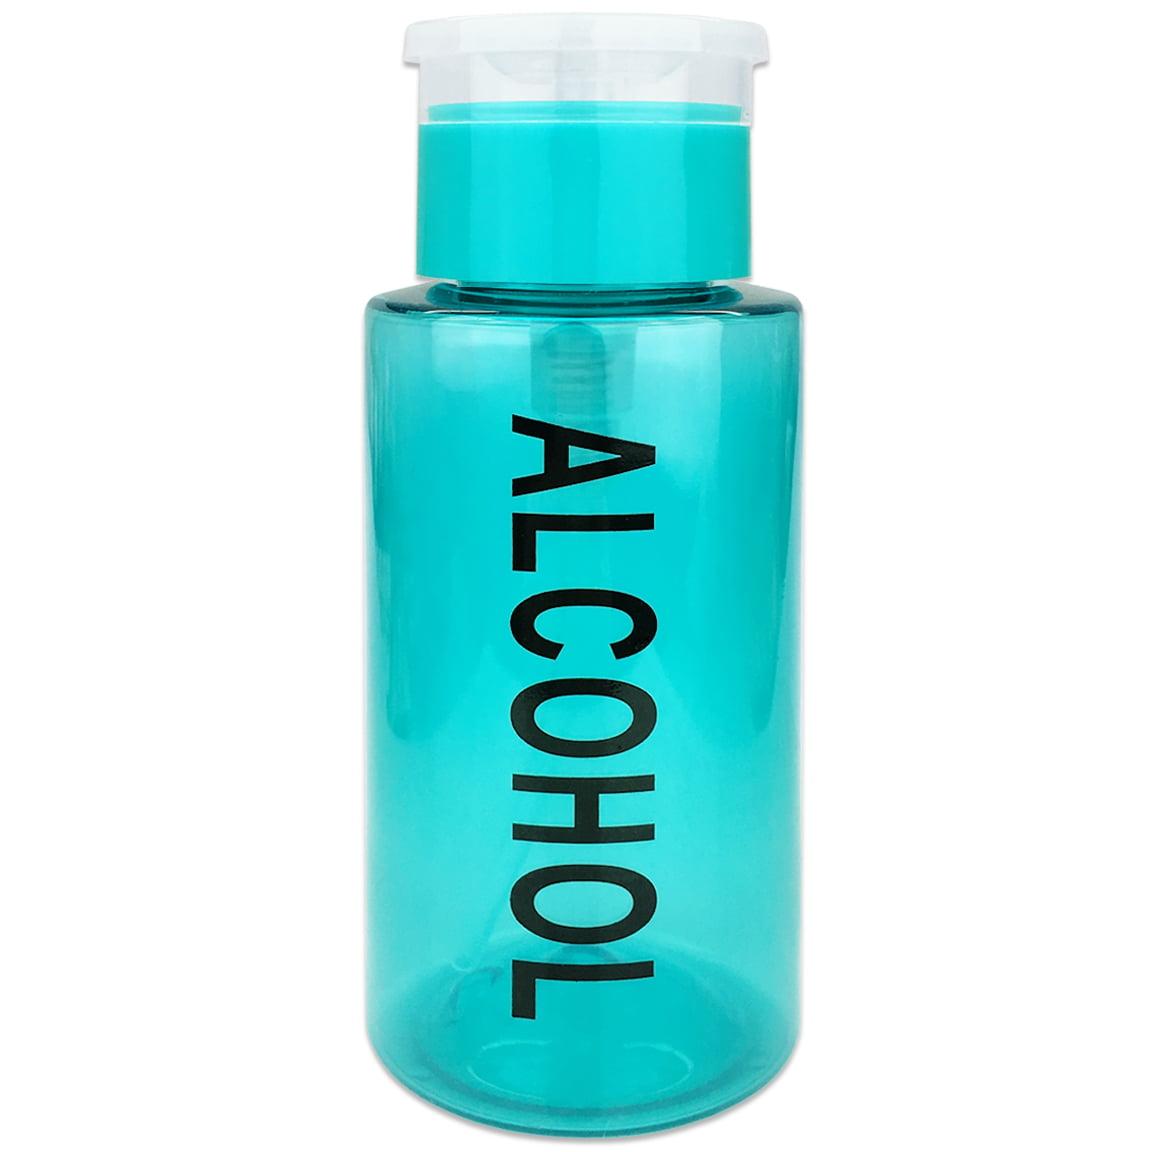 Pana High Quality 7oz Liquid Pump Dispenser With Alcohol Label - Purple